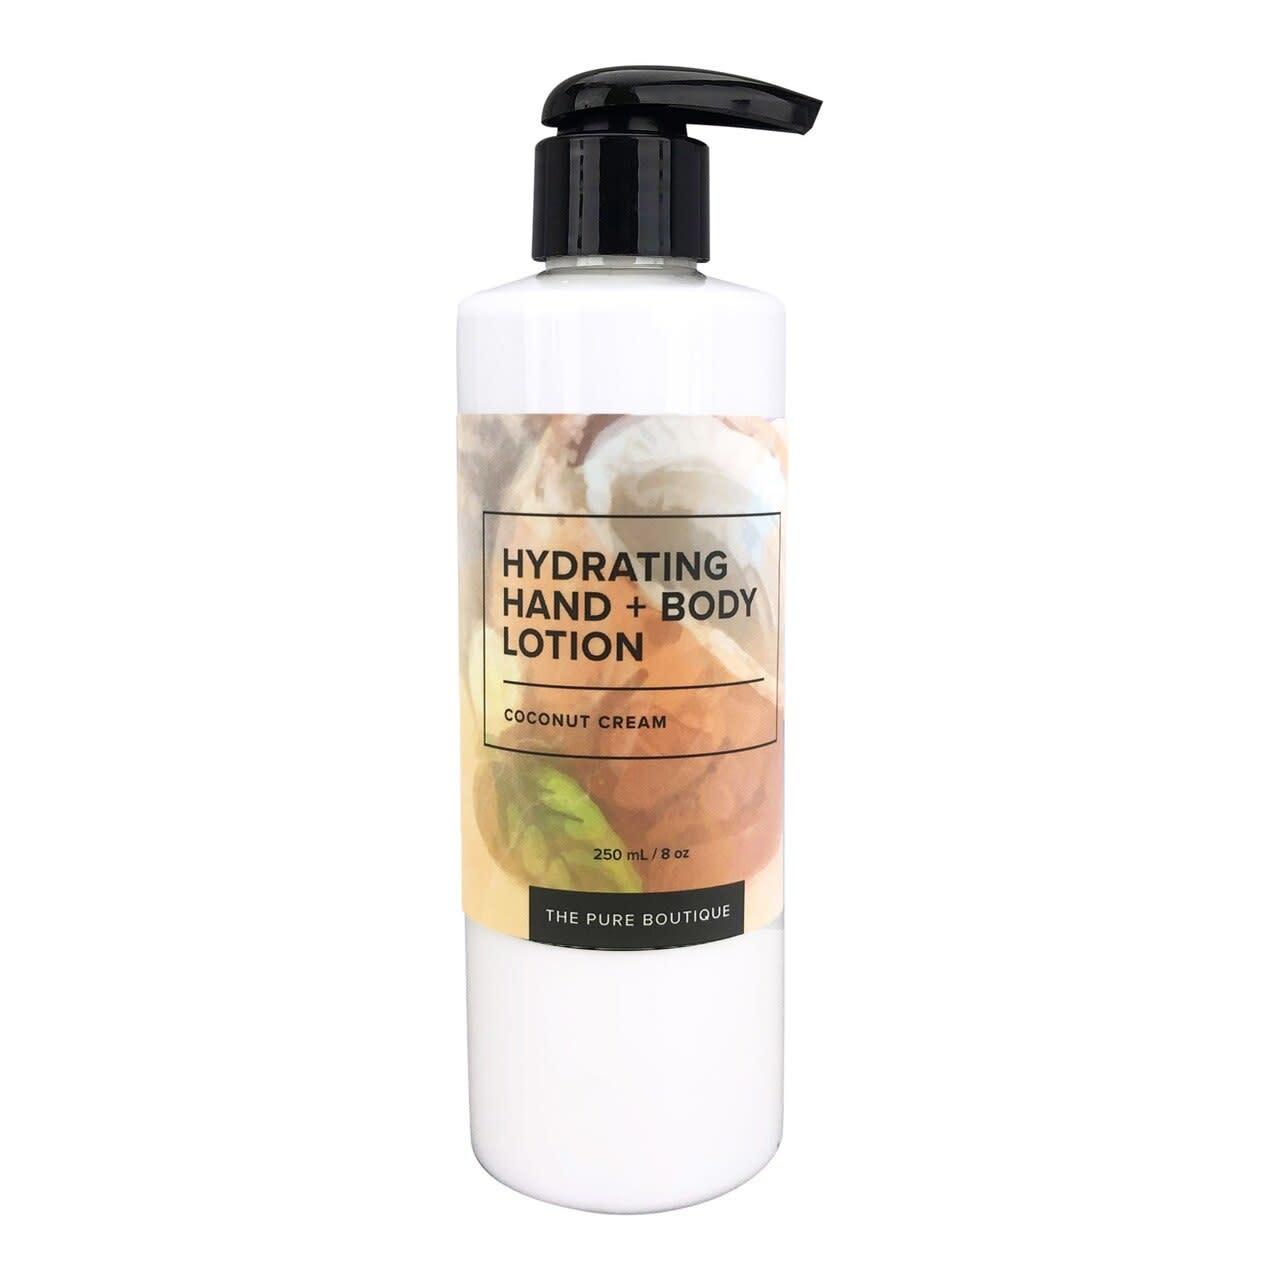 Hydrating Hand & Body Lotion - Coconut Cream-1